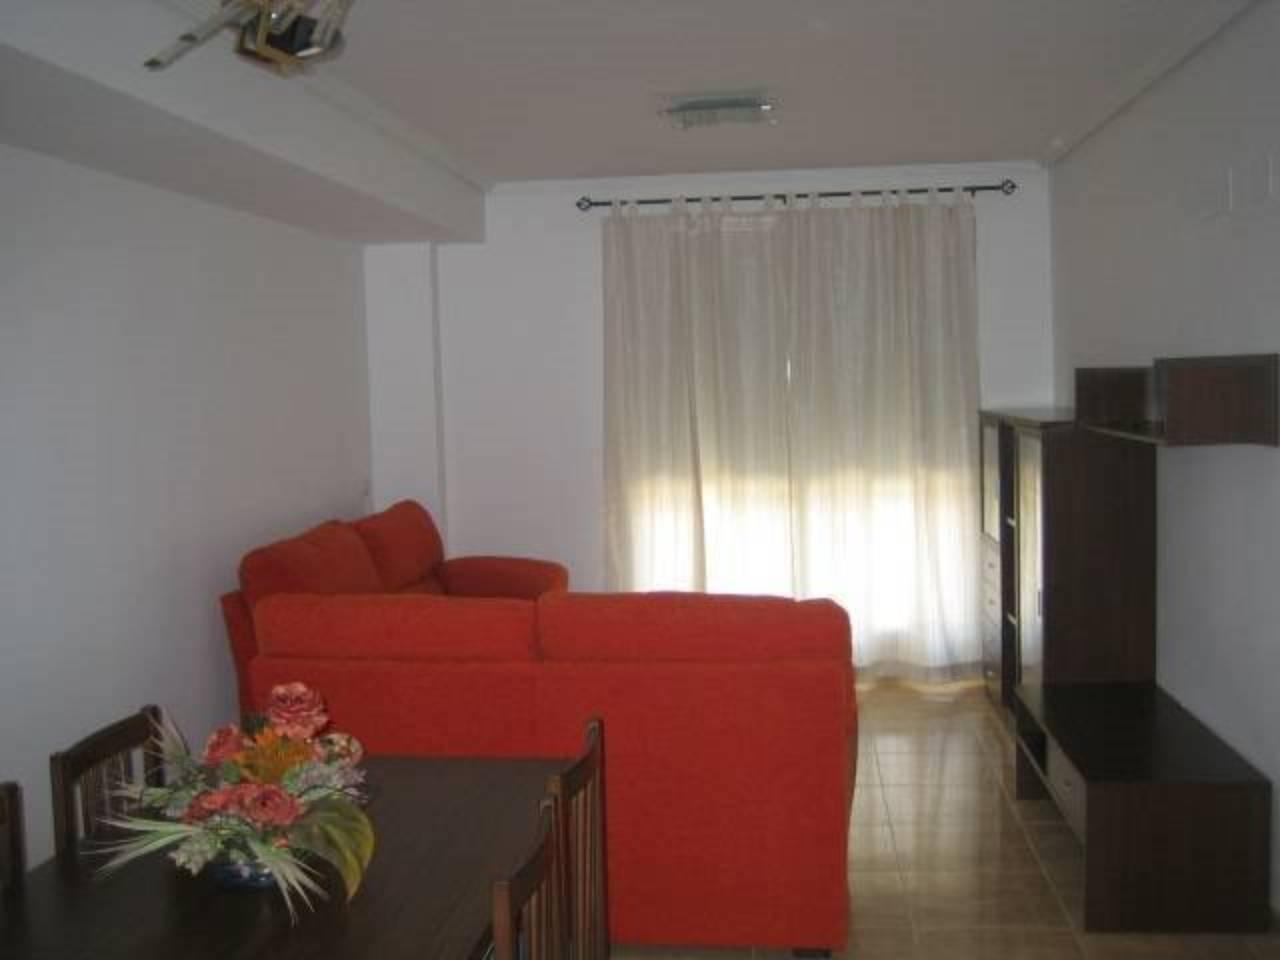 Flat  Calle tall. Superf. 116.30 m²,  3 habitaciones (2 dobles,  1 individual),  2